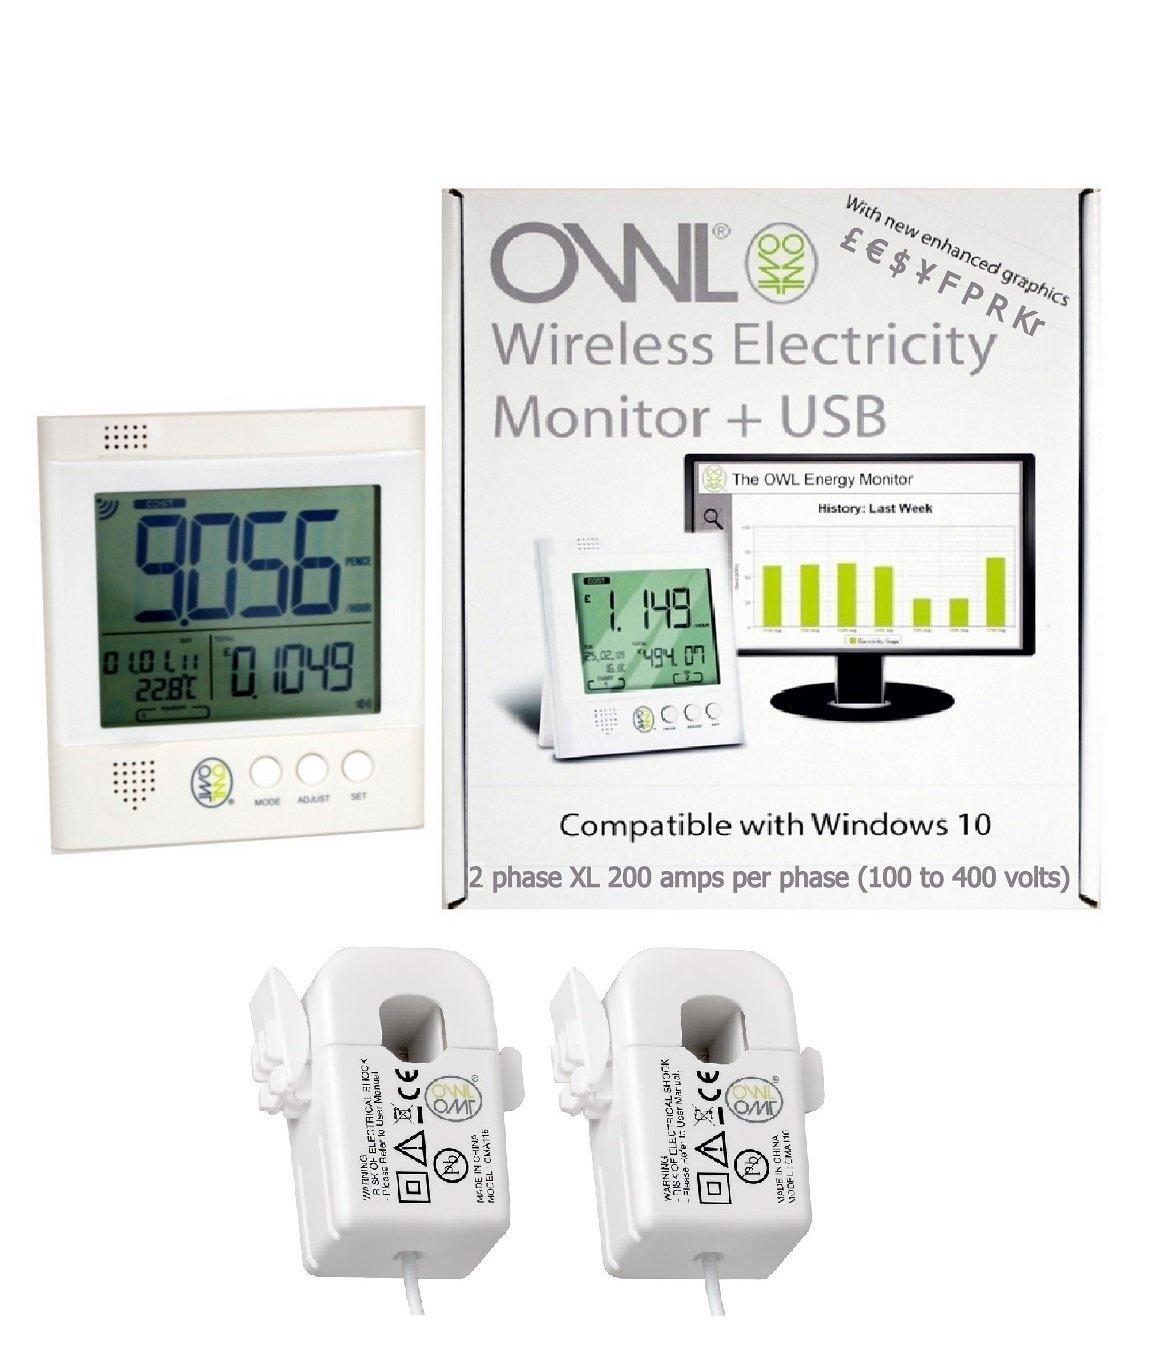 OWL +USB CM160 XL 2 Phase Wireless Energy Monitor (2 x 200 amp 17mm CT Sensors)